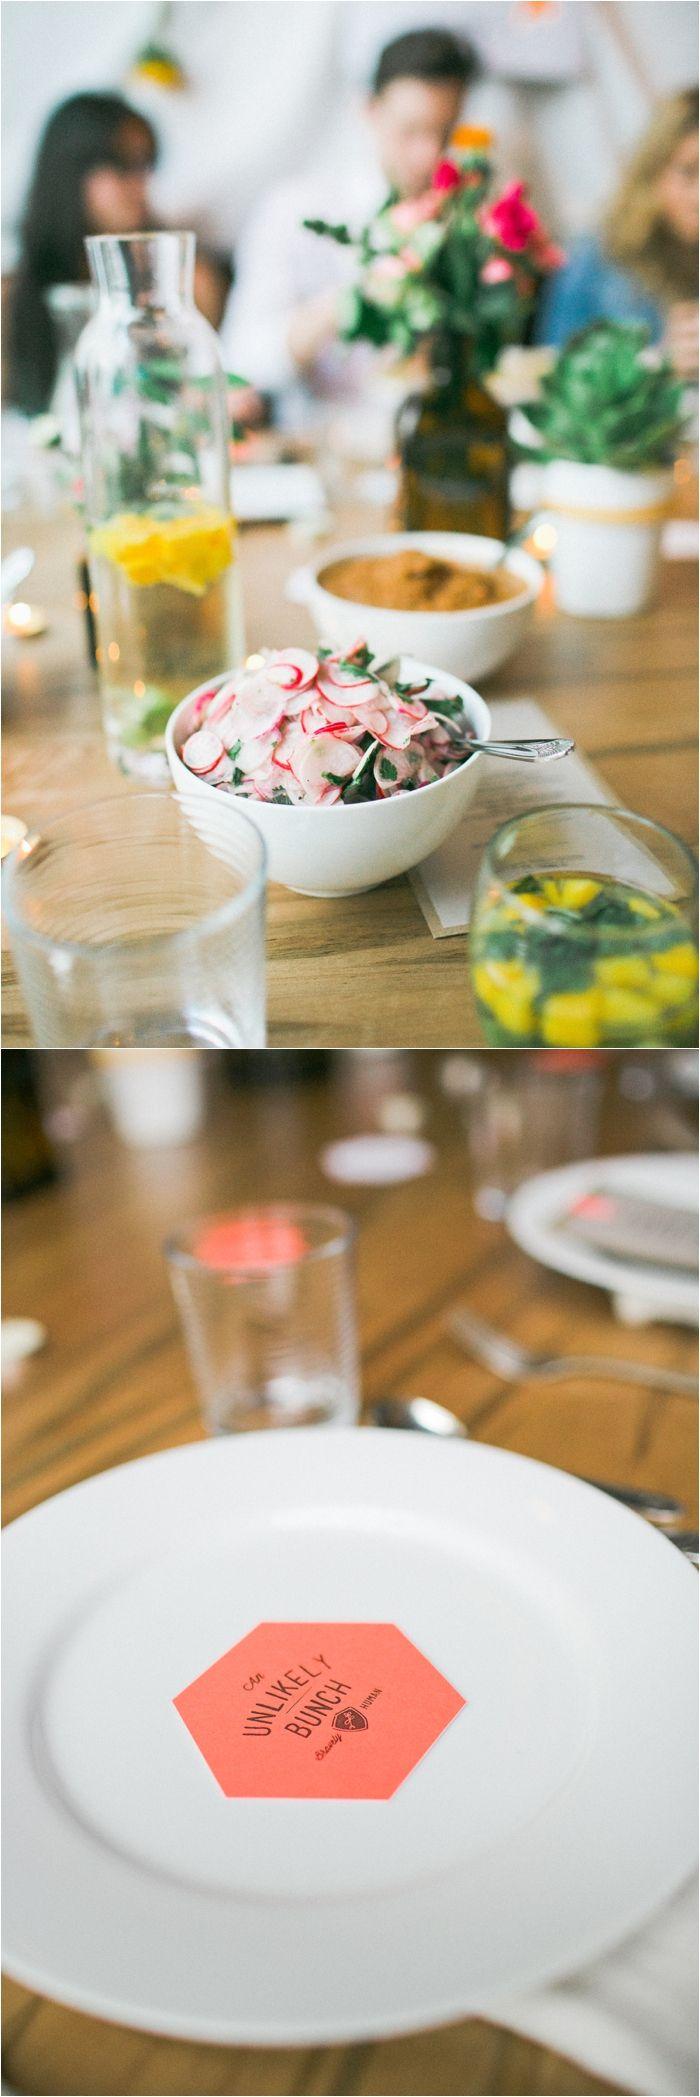 radish salad, an unlikely brunch